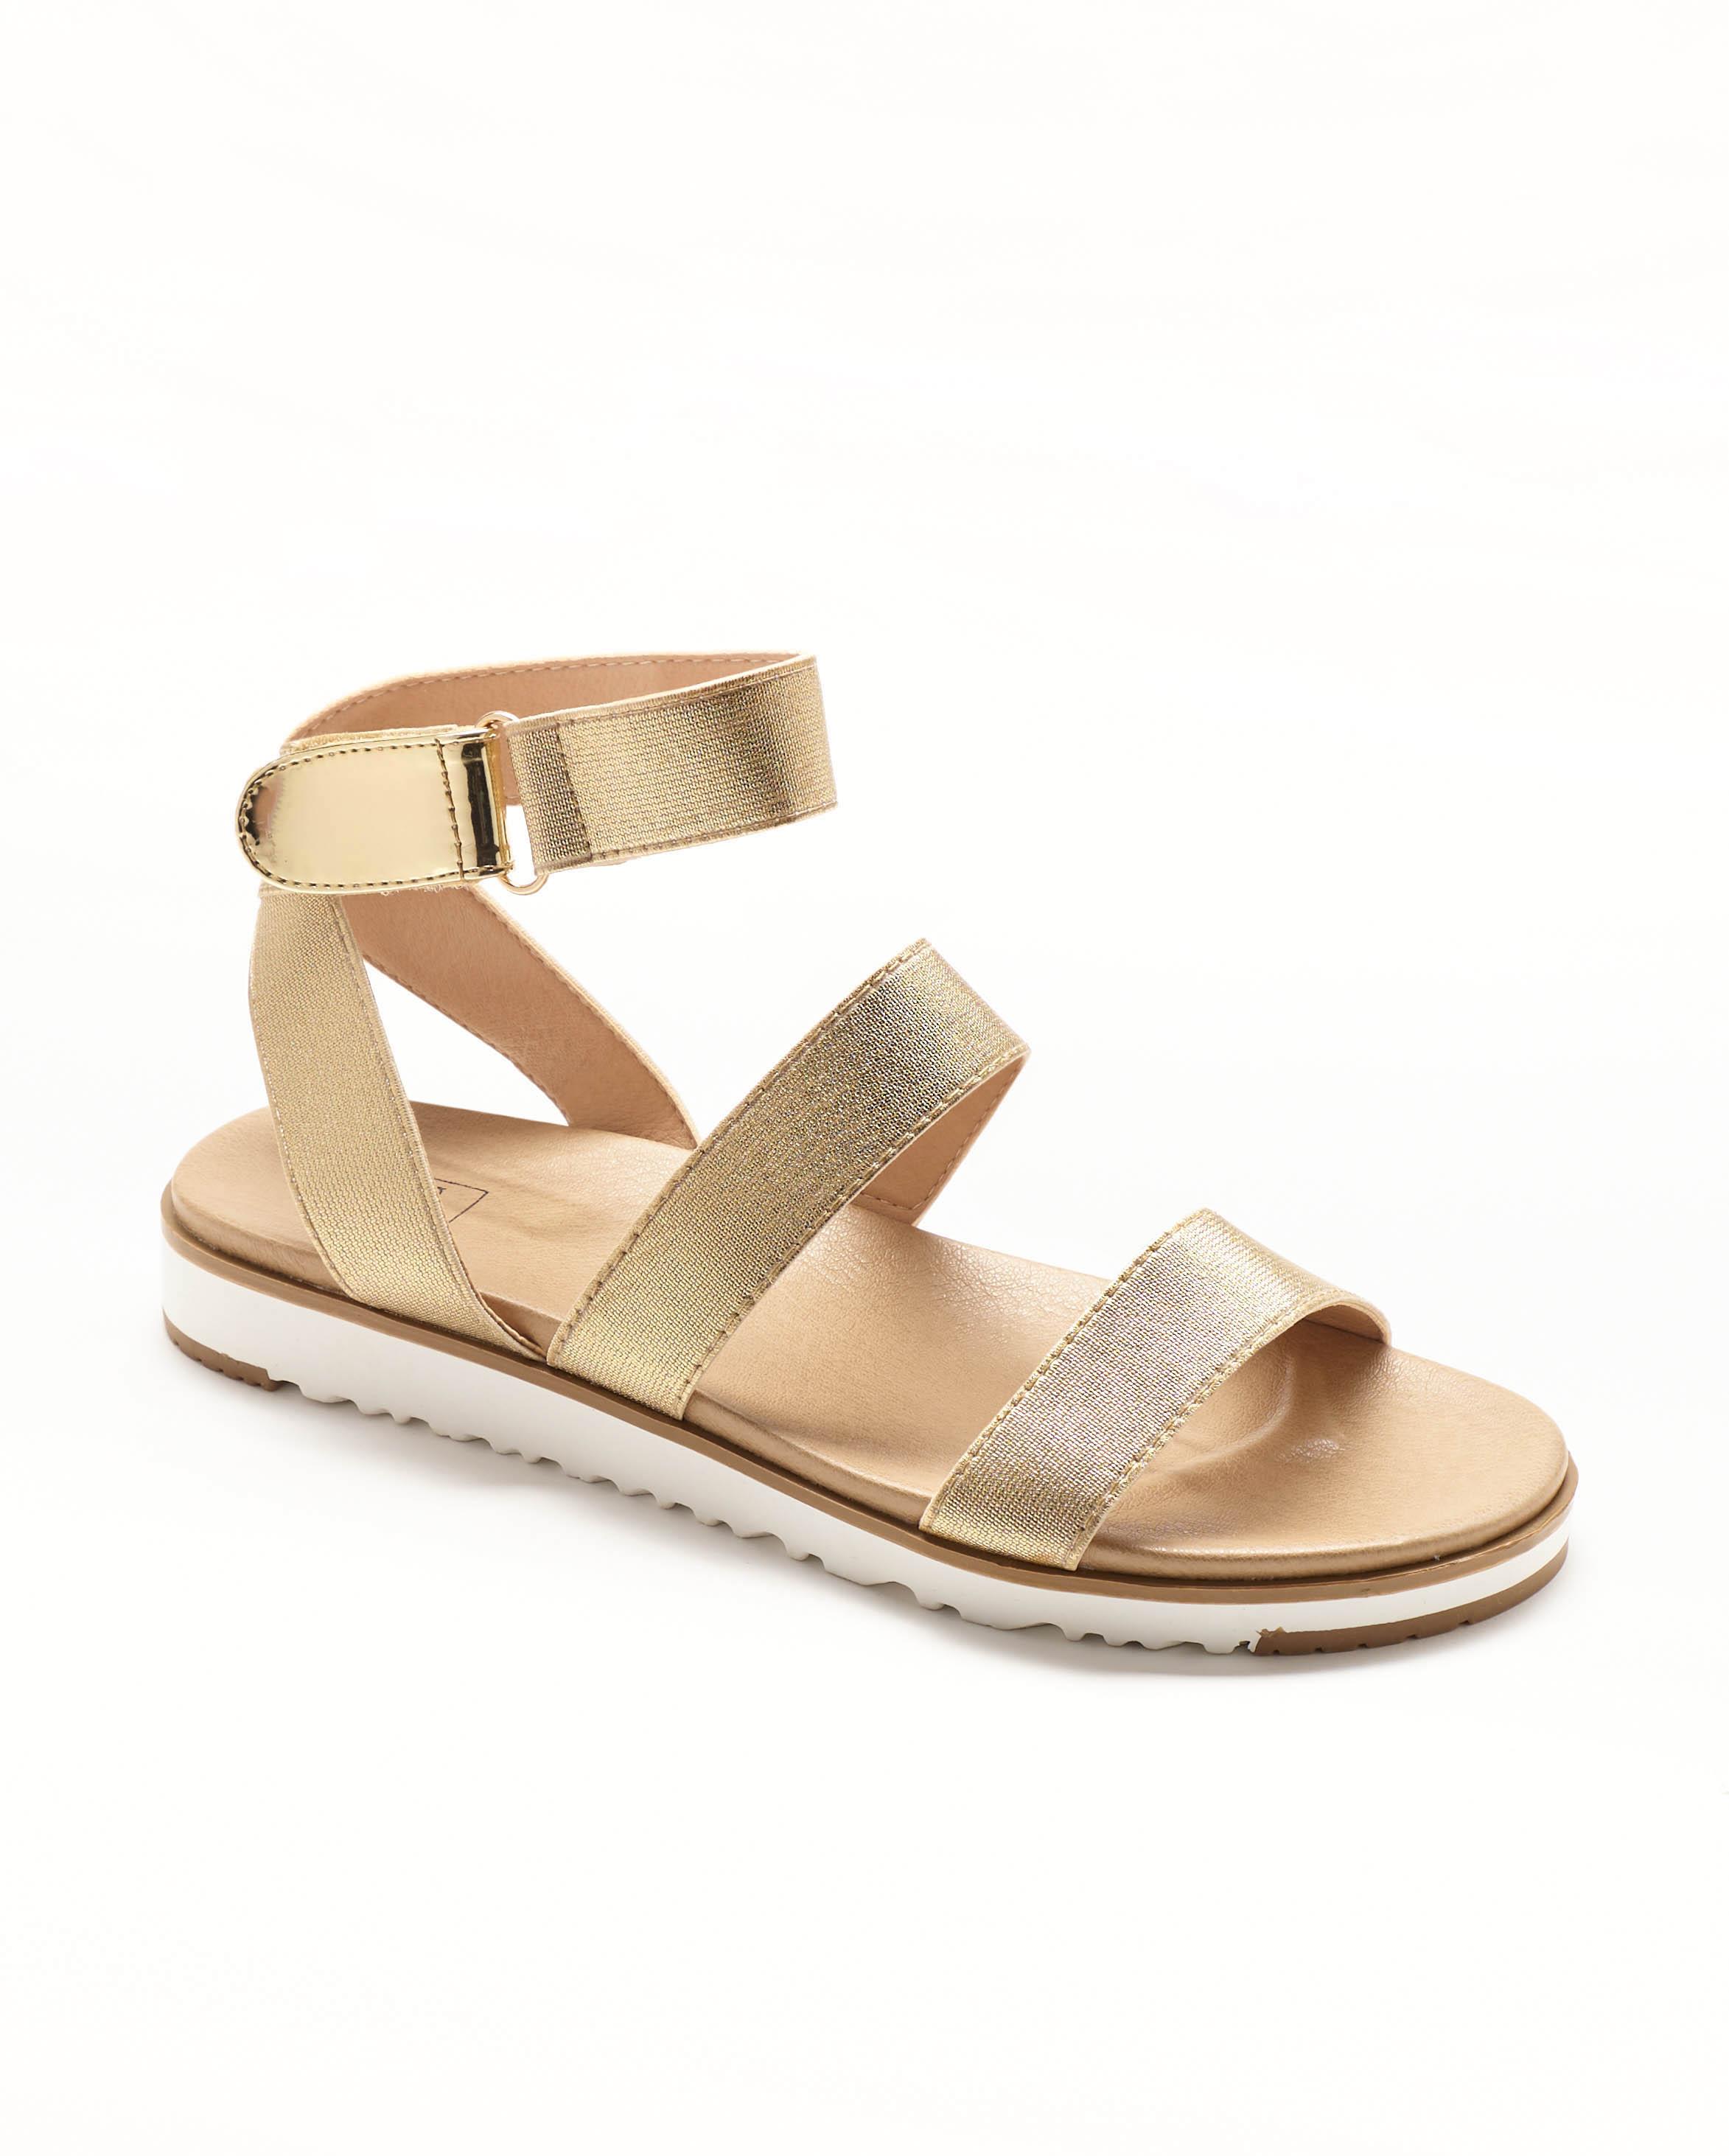 Sandales Plates Femme - Sandale Plate Or Jina - M20s1463-24